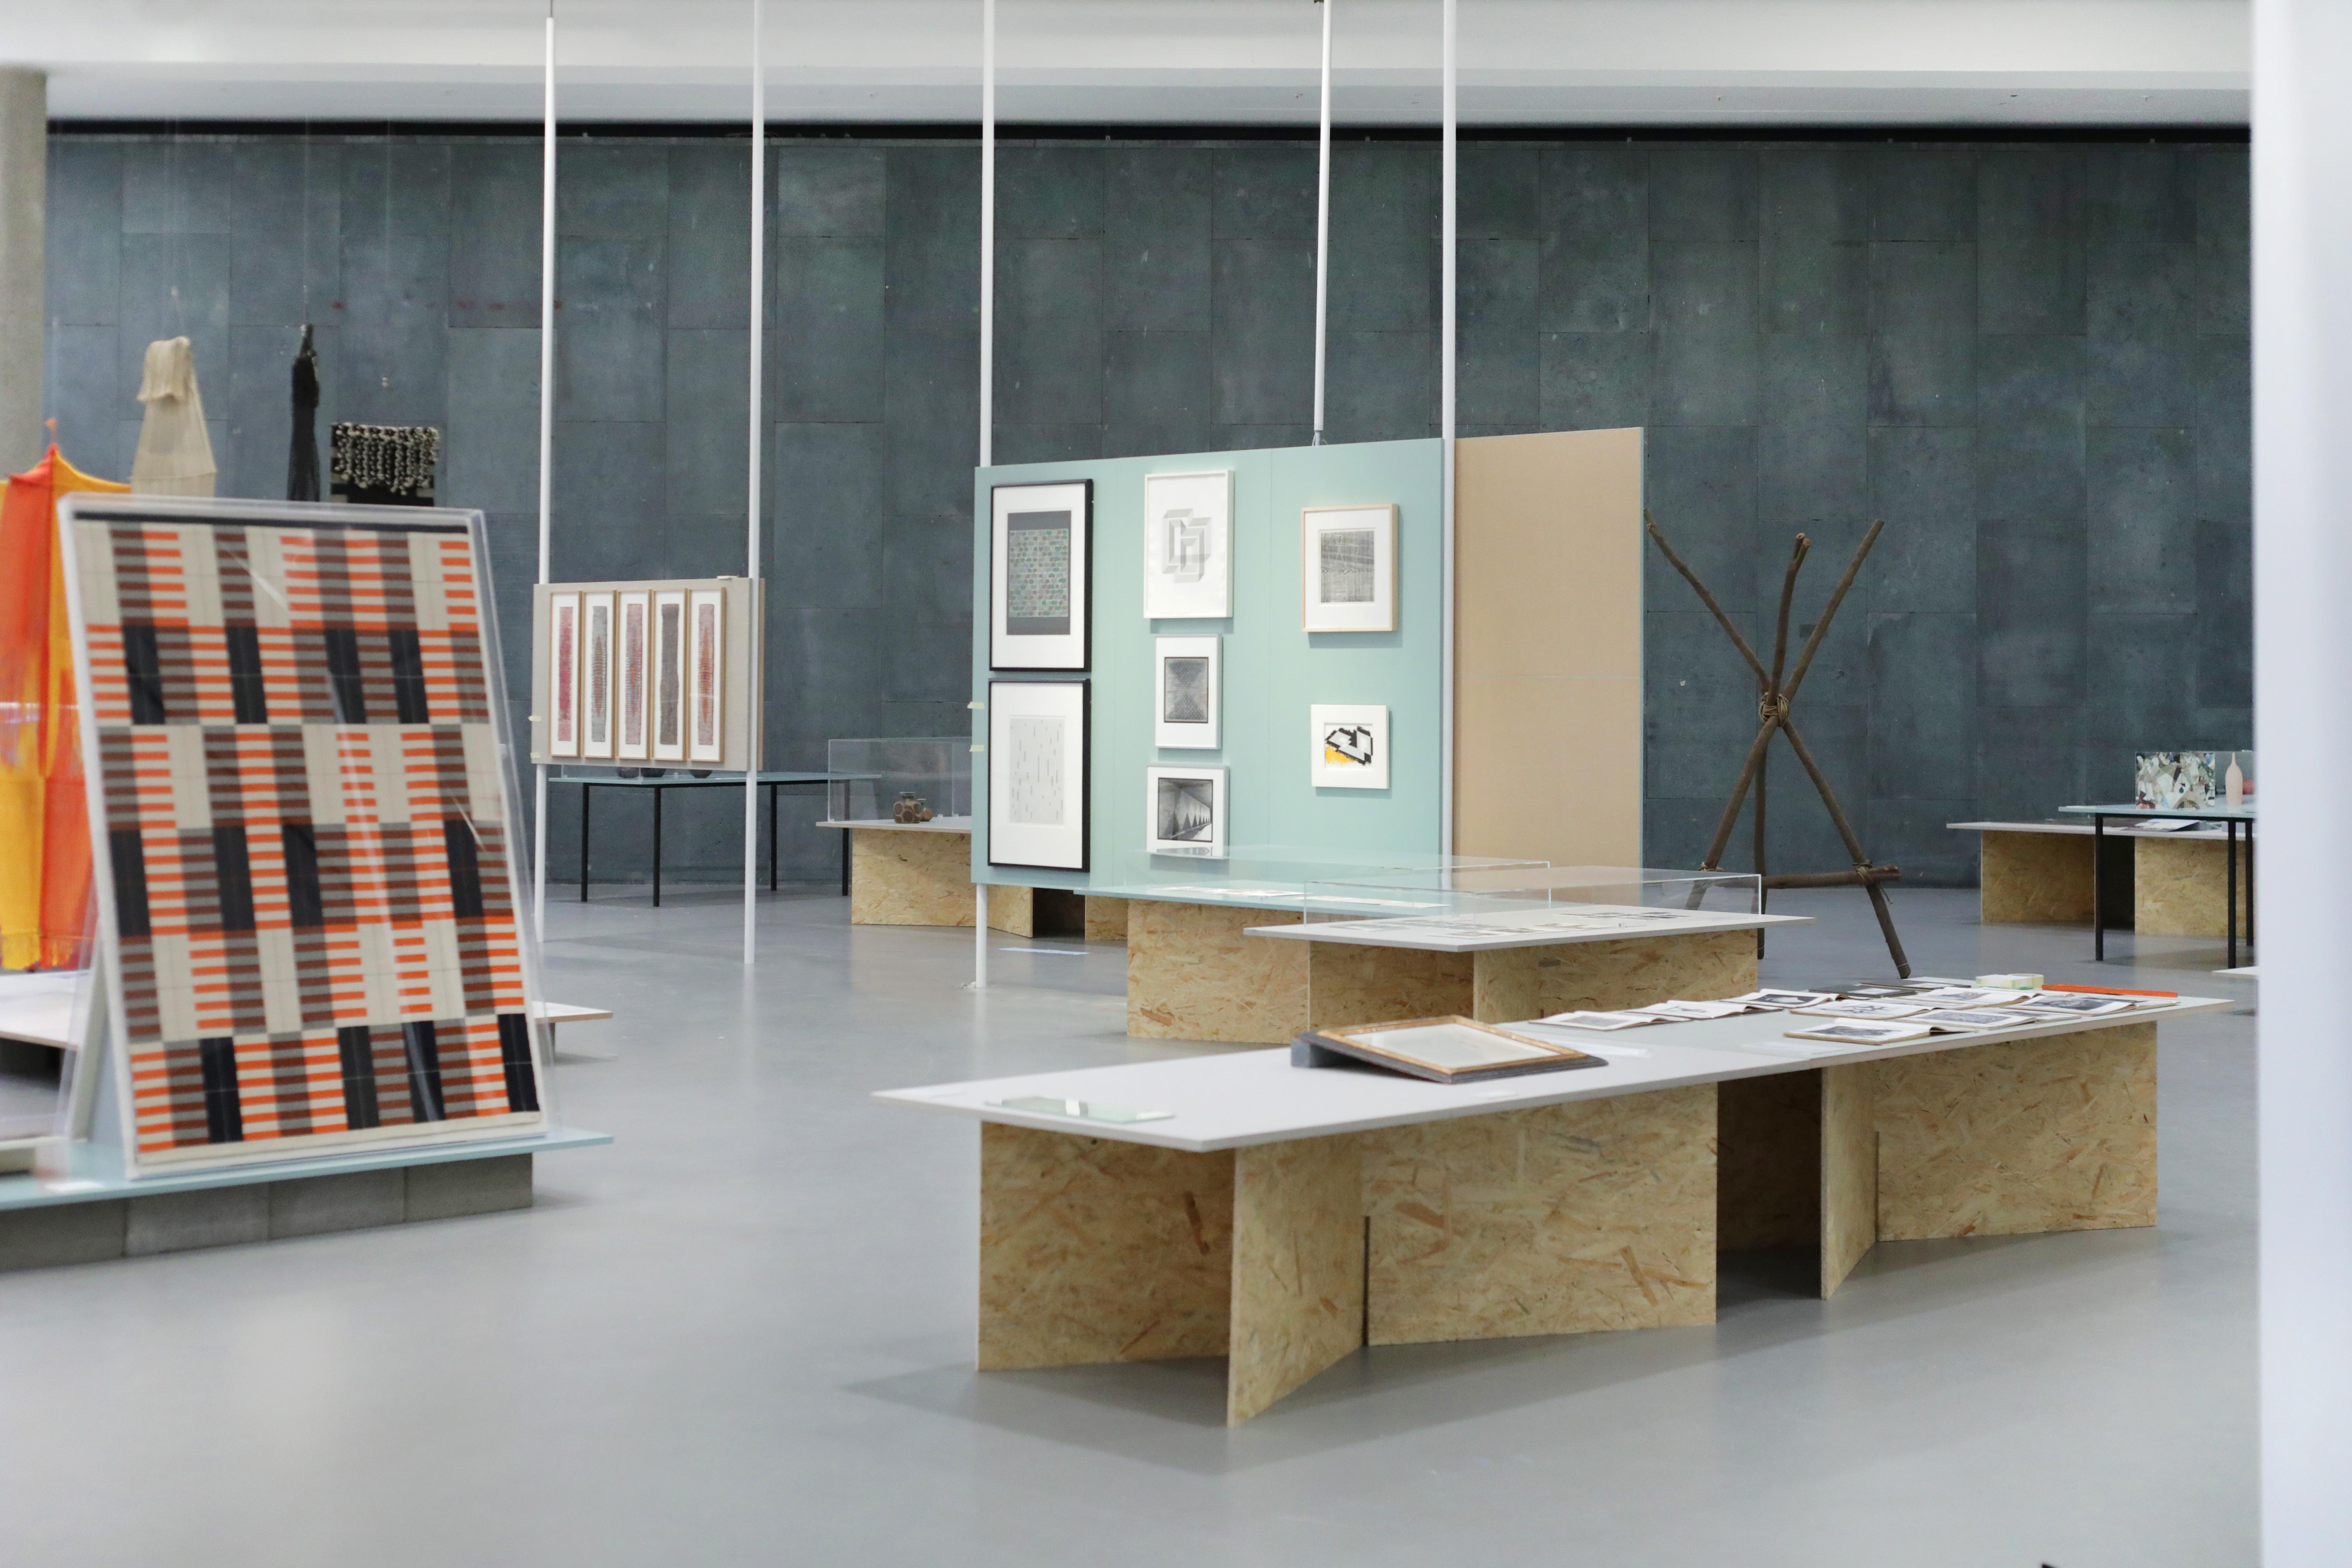 Bauhaus Imaginista im HKW | Foto: ©Silke Briel / HKW